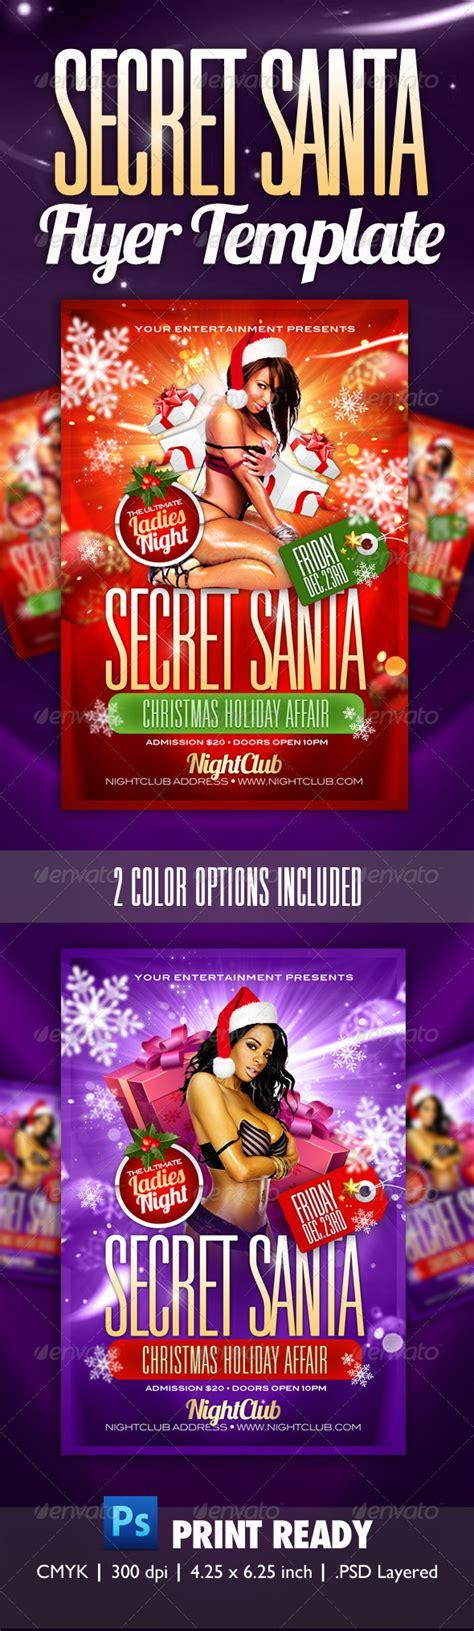 Secret Santa Party Flyer Template Print Ad Templates Secret Santa Flyer Templates